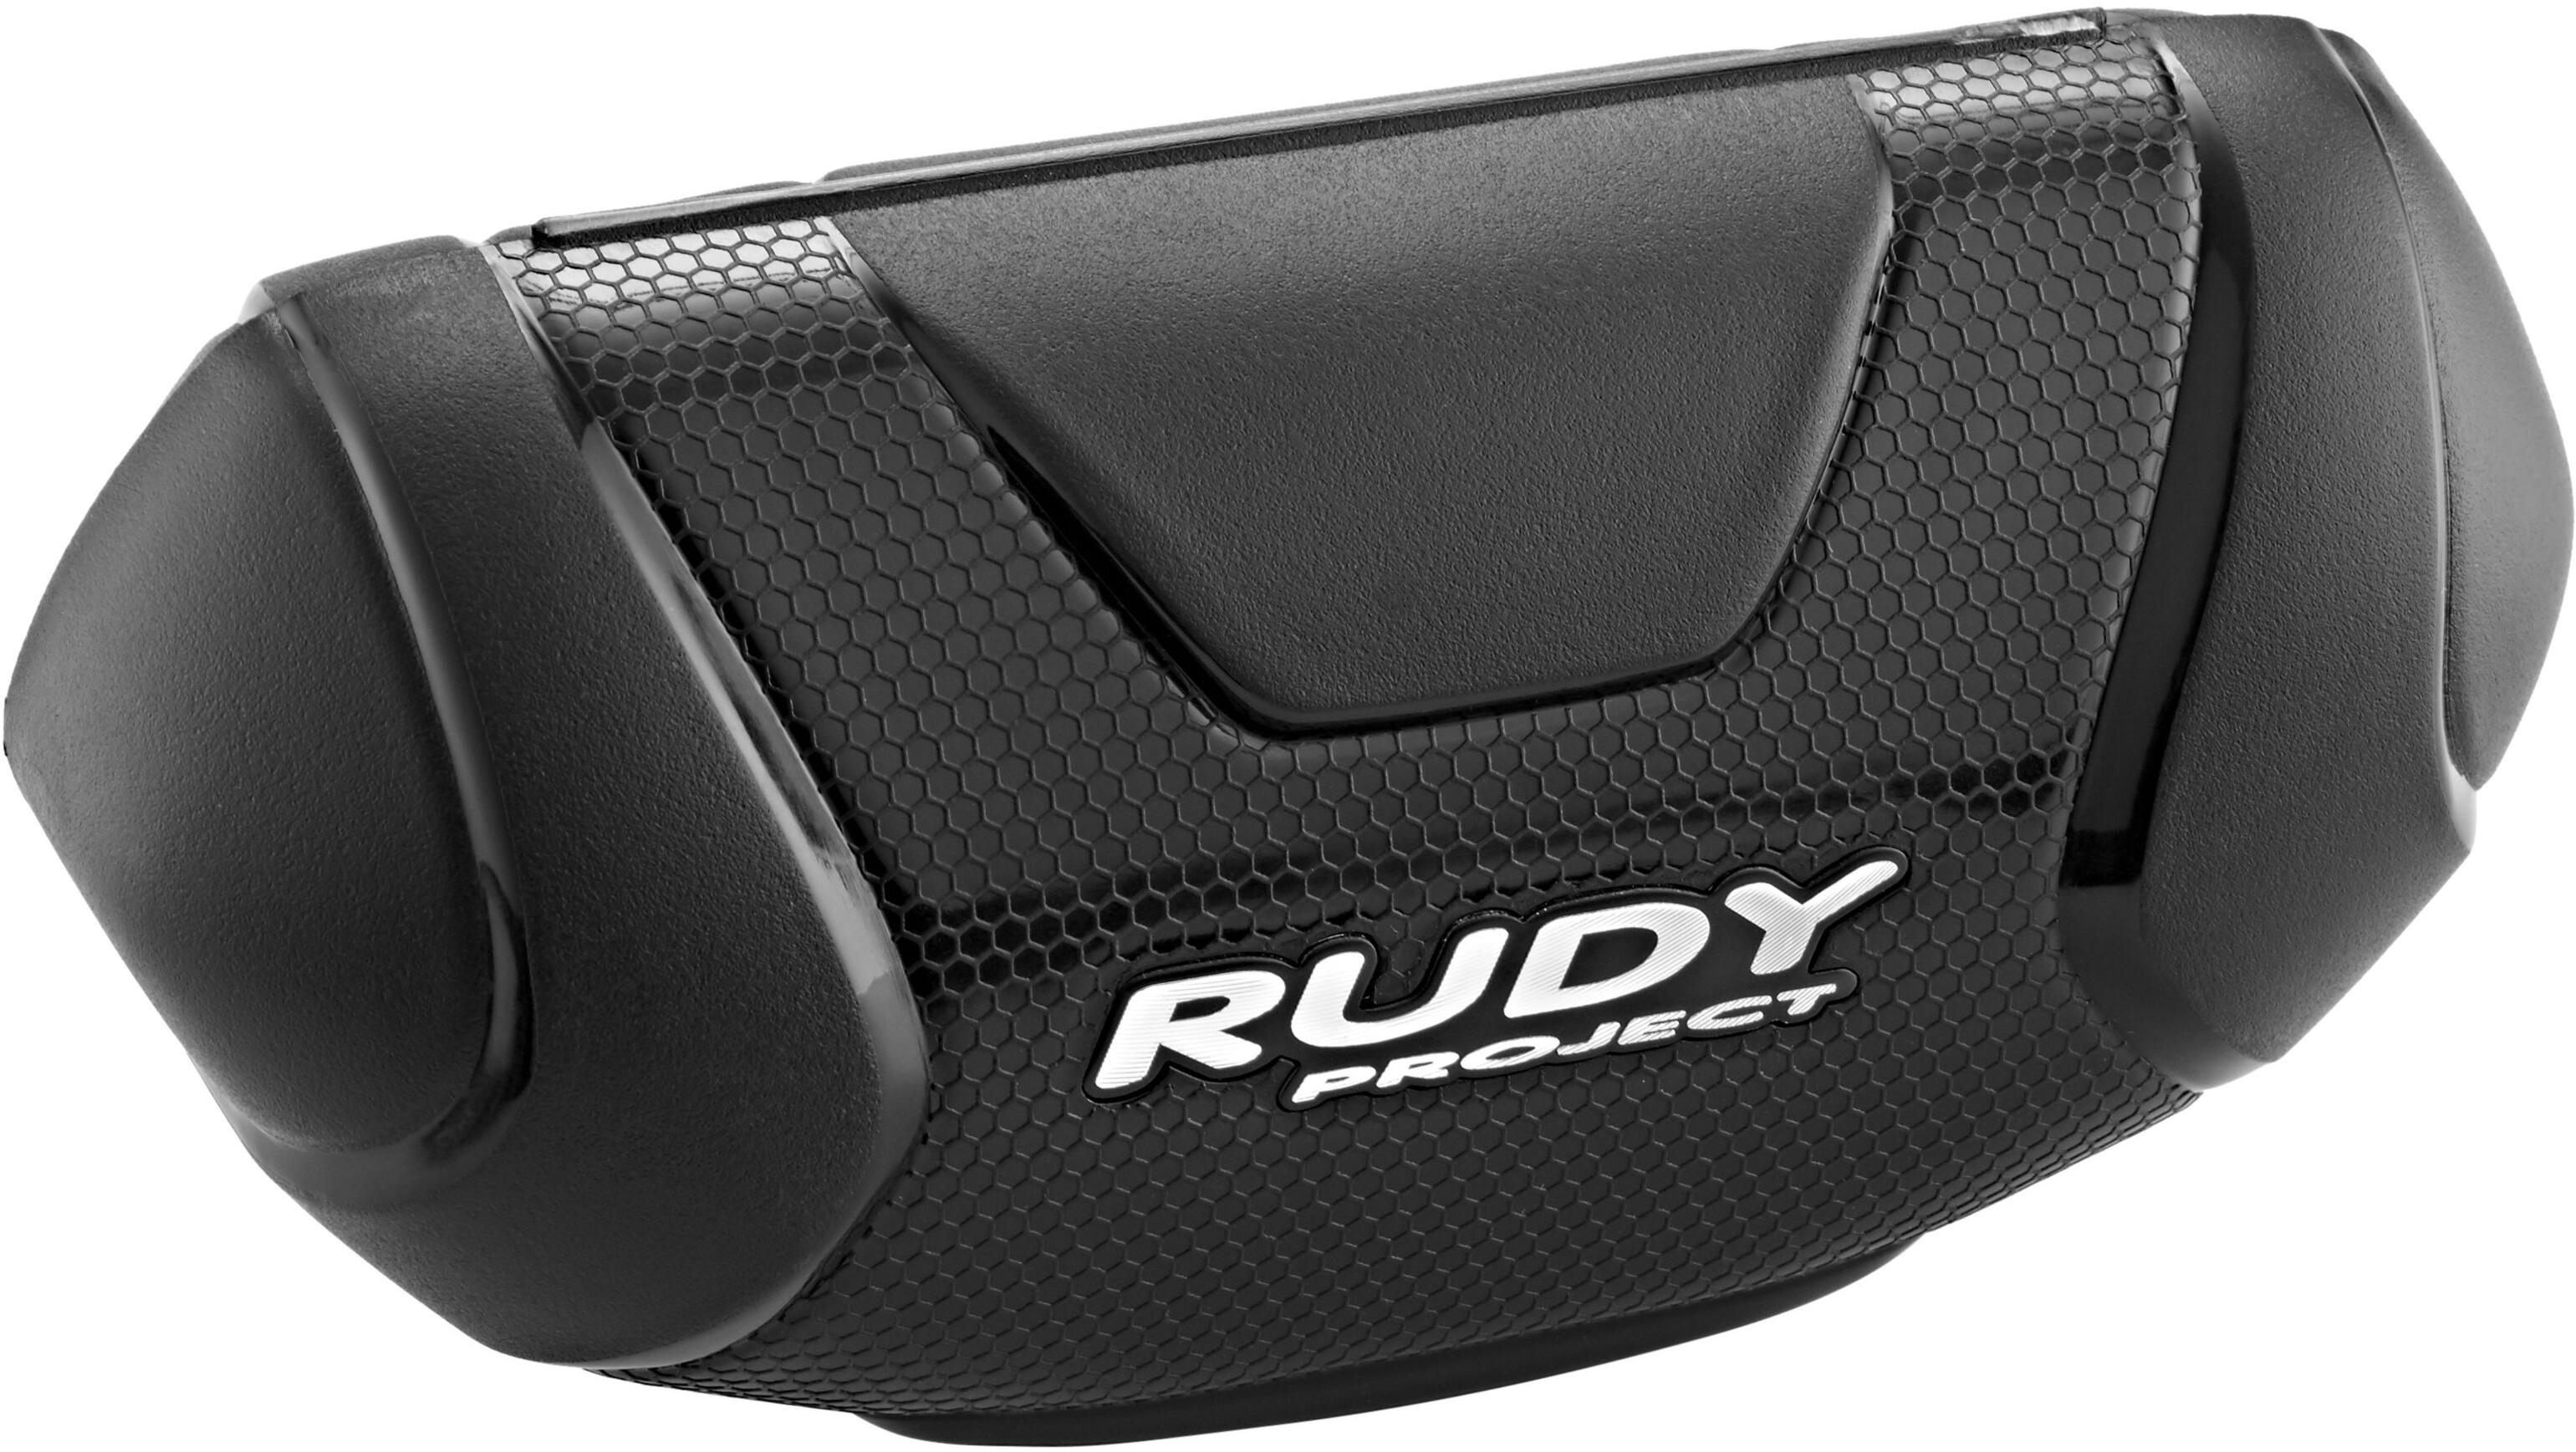 Rudy Project Fotonyk Pyöräilylasit  218b189de1